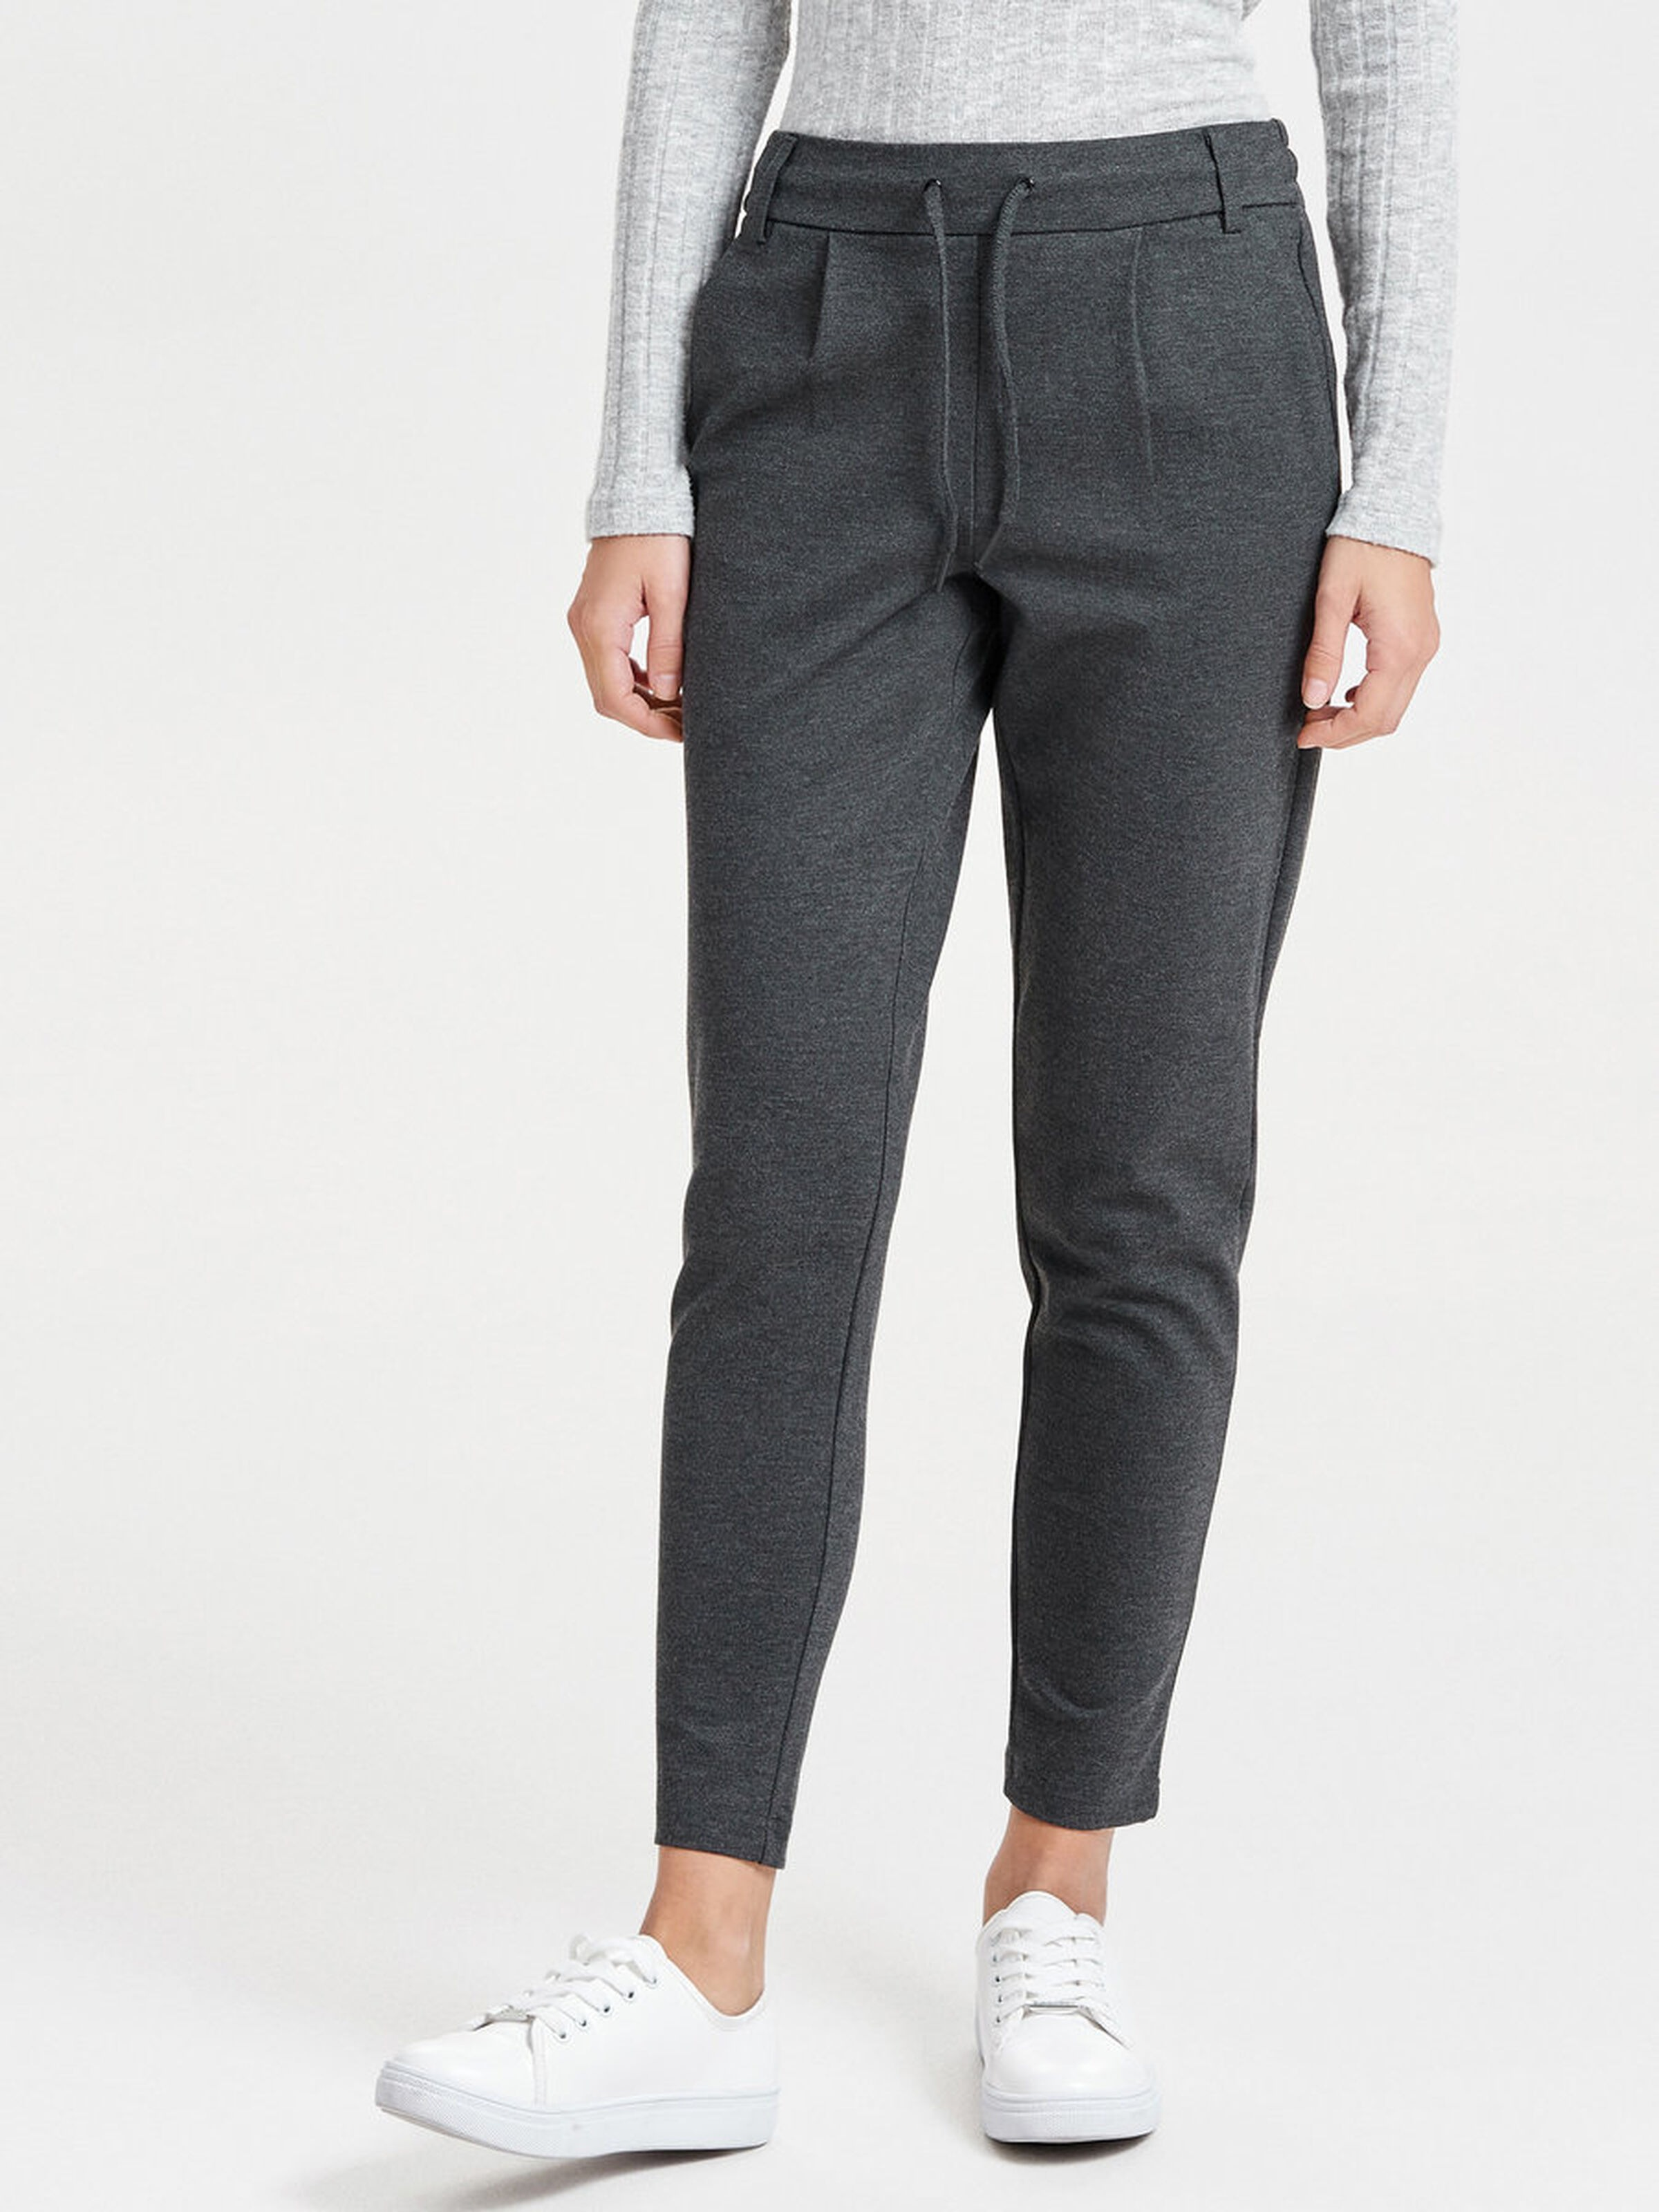 Pantalone con laccio ONLY | Pantalone | 15115847DARK GREY MELANGE